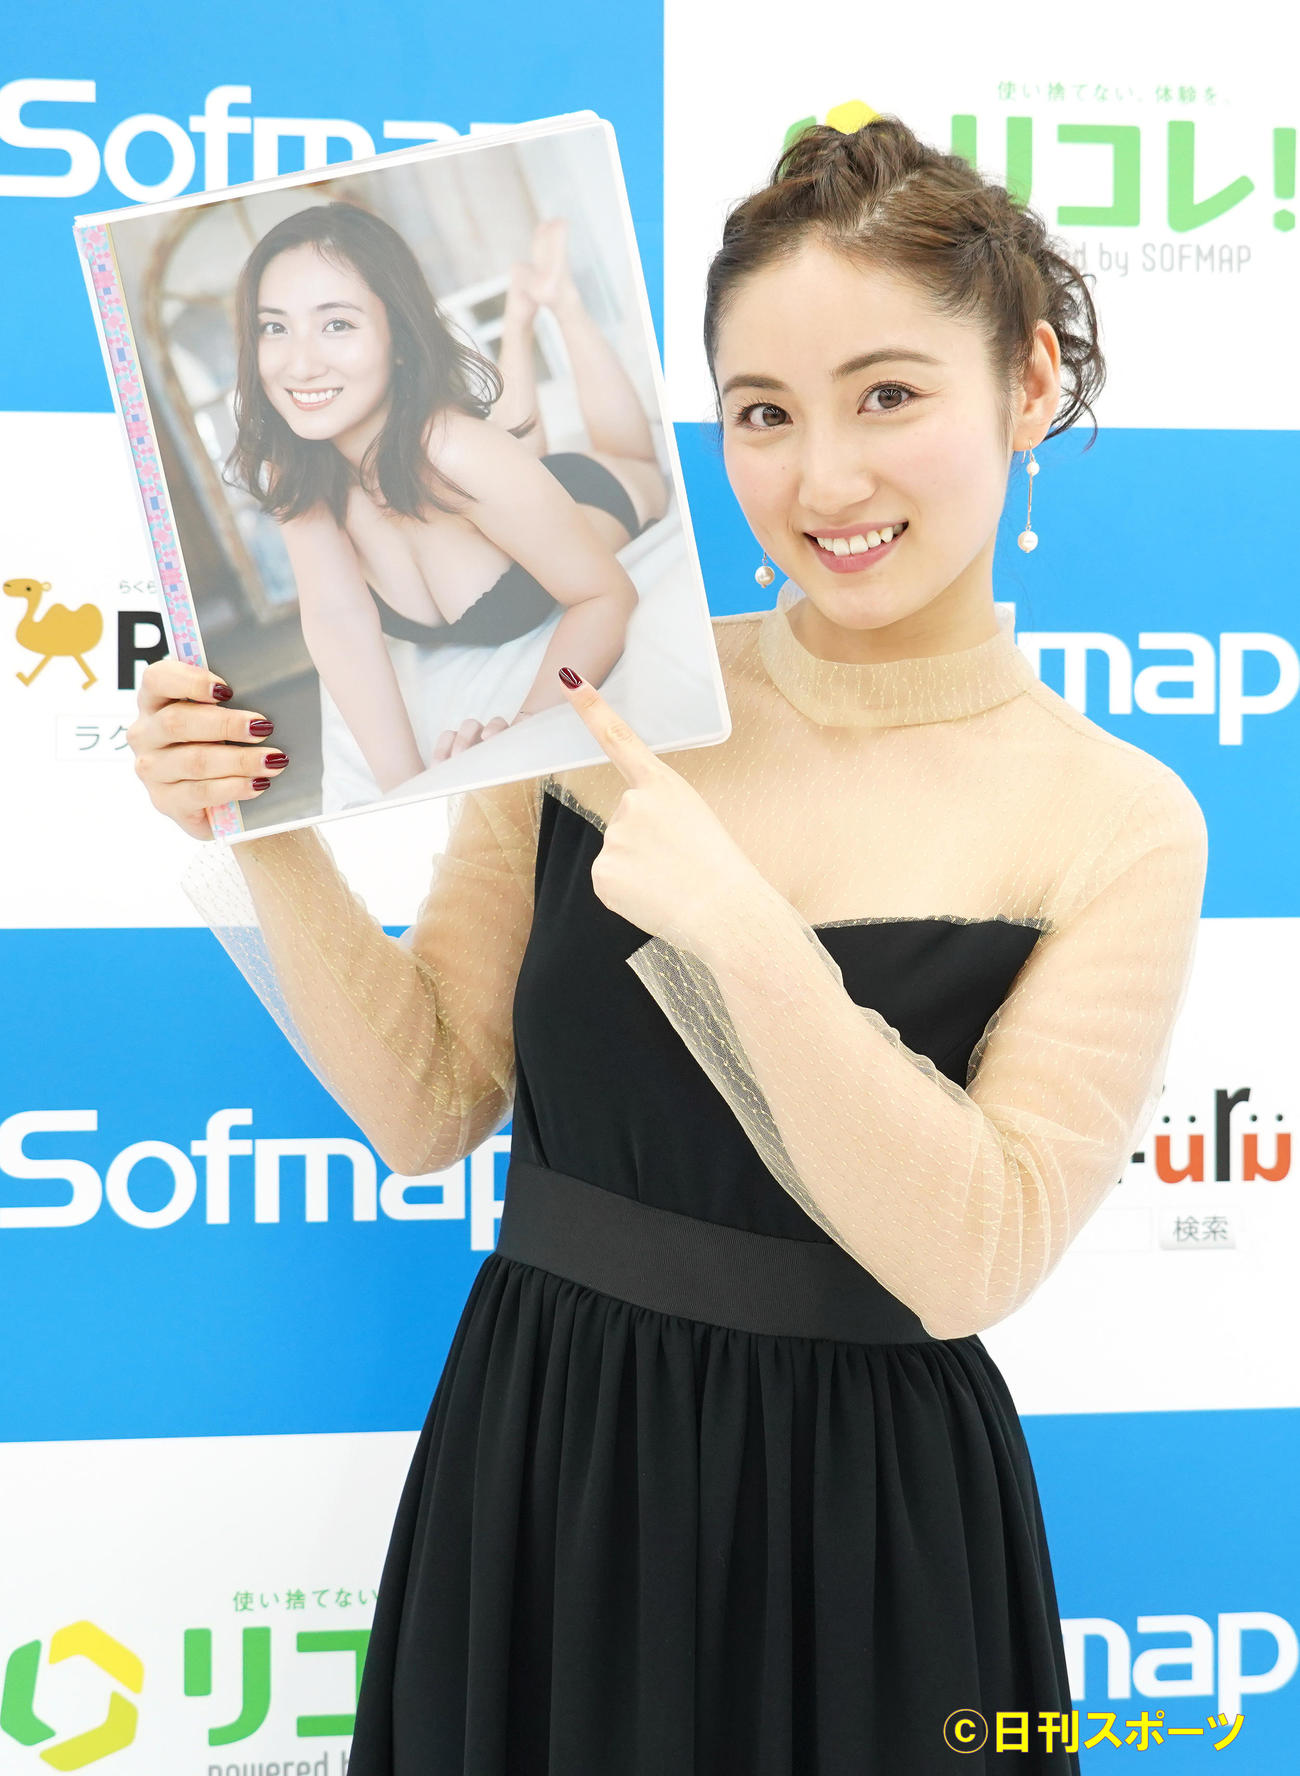 15thアニバーサリートレーディングカード発売記念イベントでトレーディングカードのファイルを持つ紗綾(撮影・佐藤成)